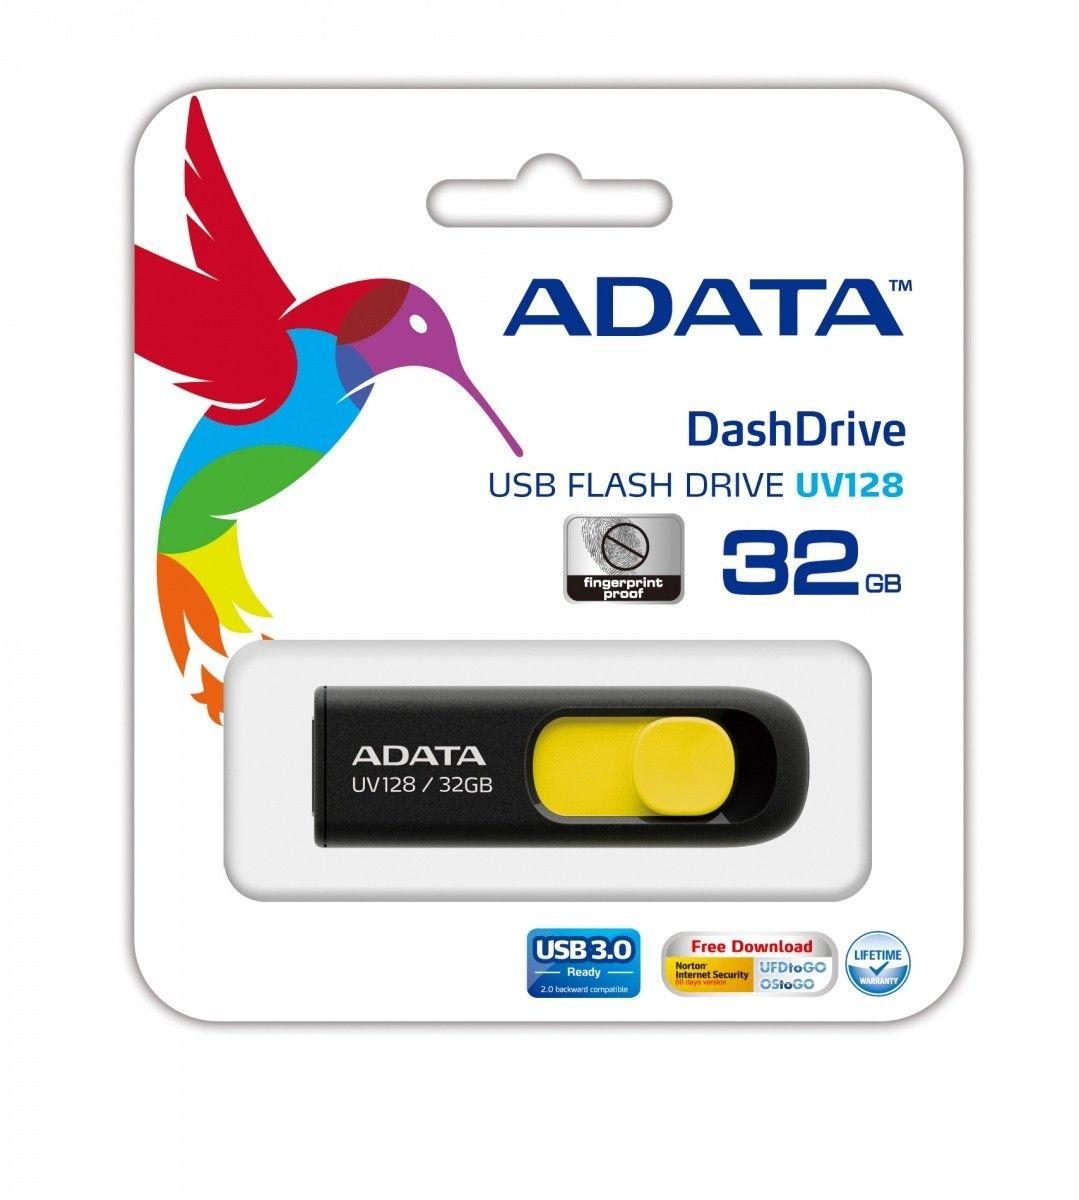 A-Data Adata pamięć USB DashDrive UV128 32GB USB 3.0 Czarny+Yellow